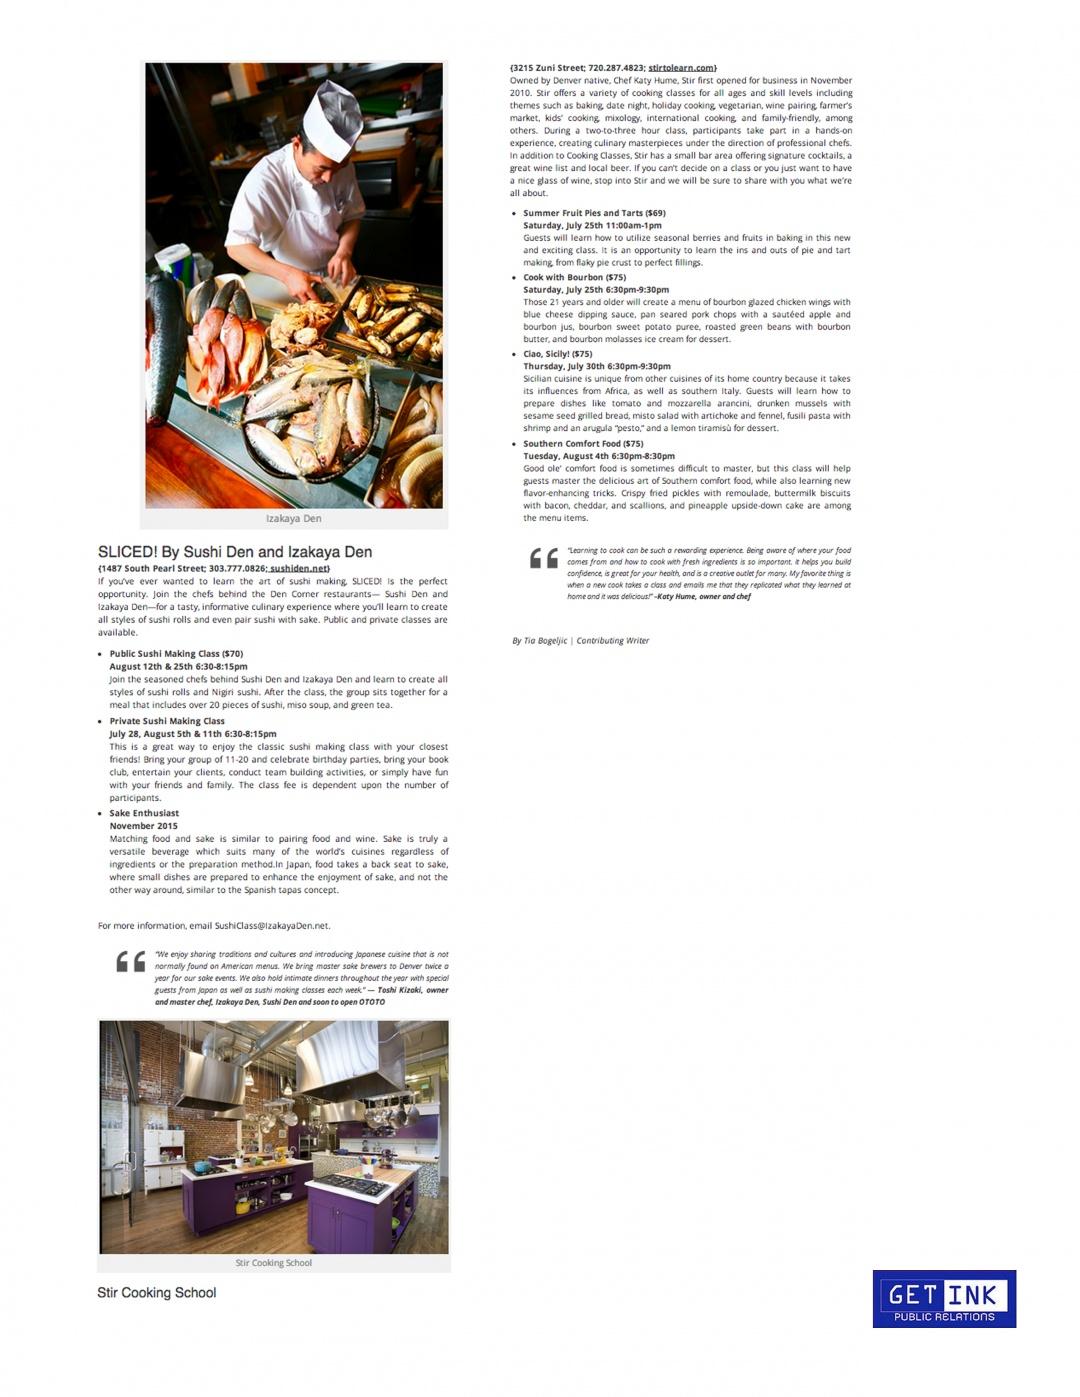 DiningOut.com 7.23.15 Part 2